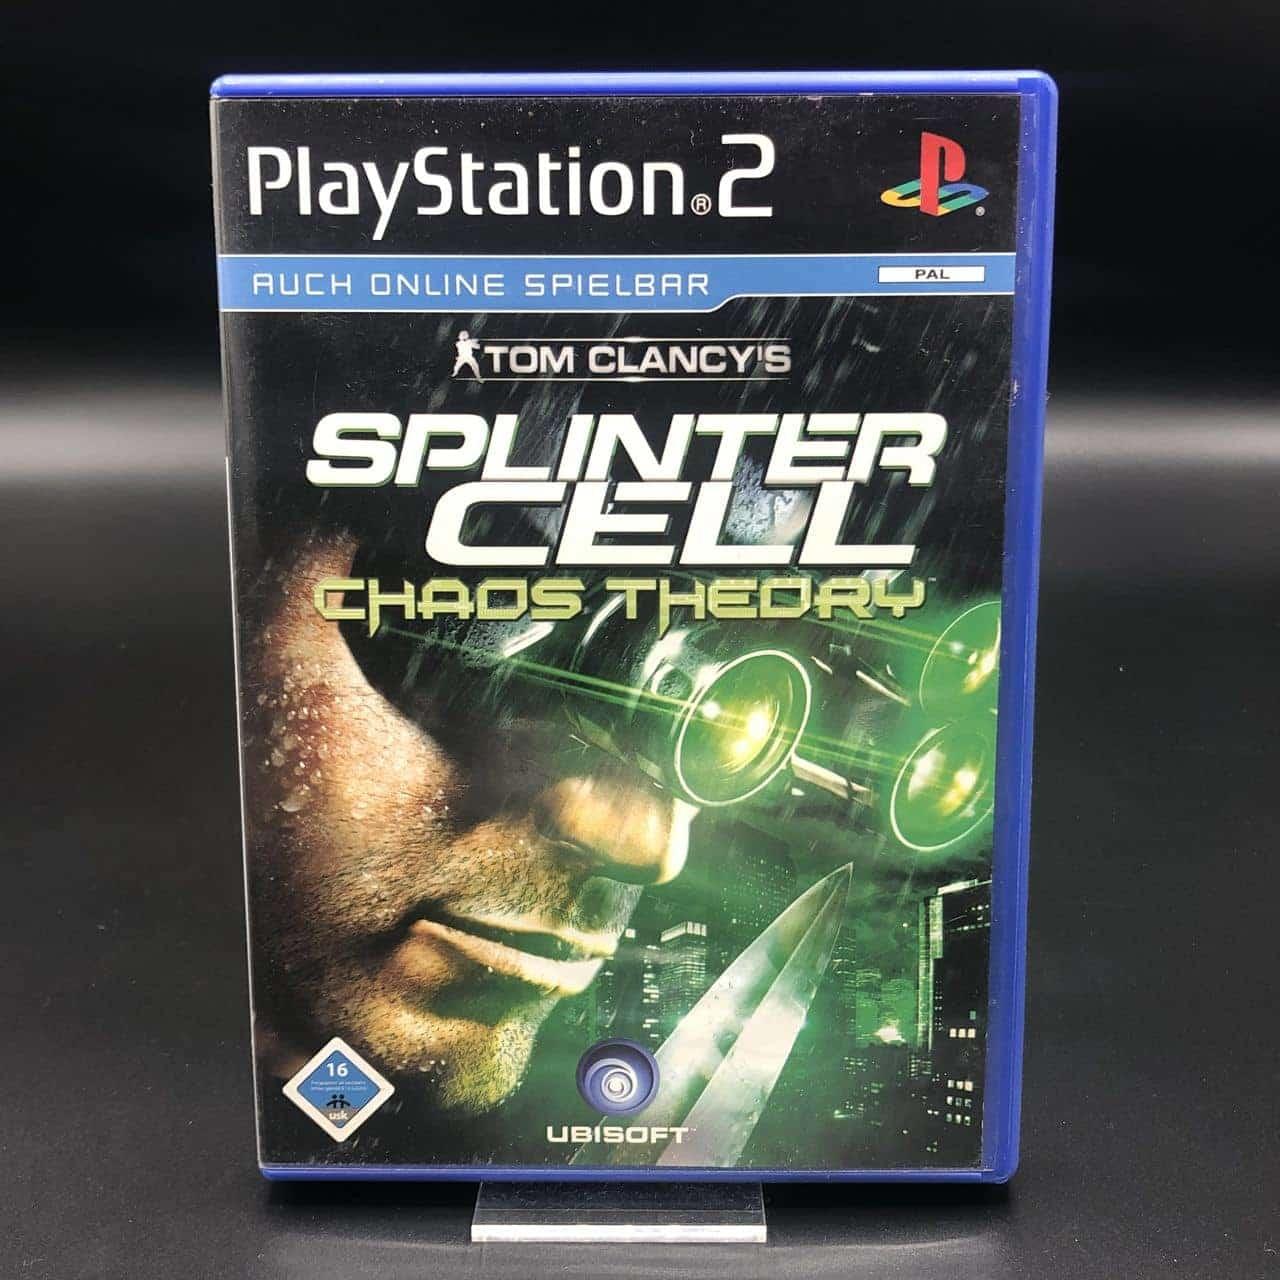 PS2 Tom Clancy's Splinter Cell: Chaos Theory (Komplett) (Sehr gut) Sony PlayStation 2